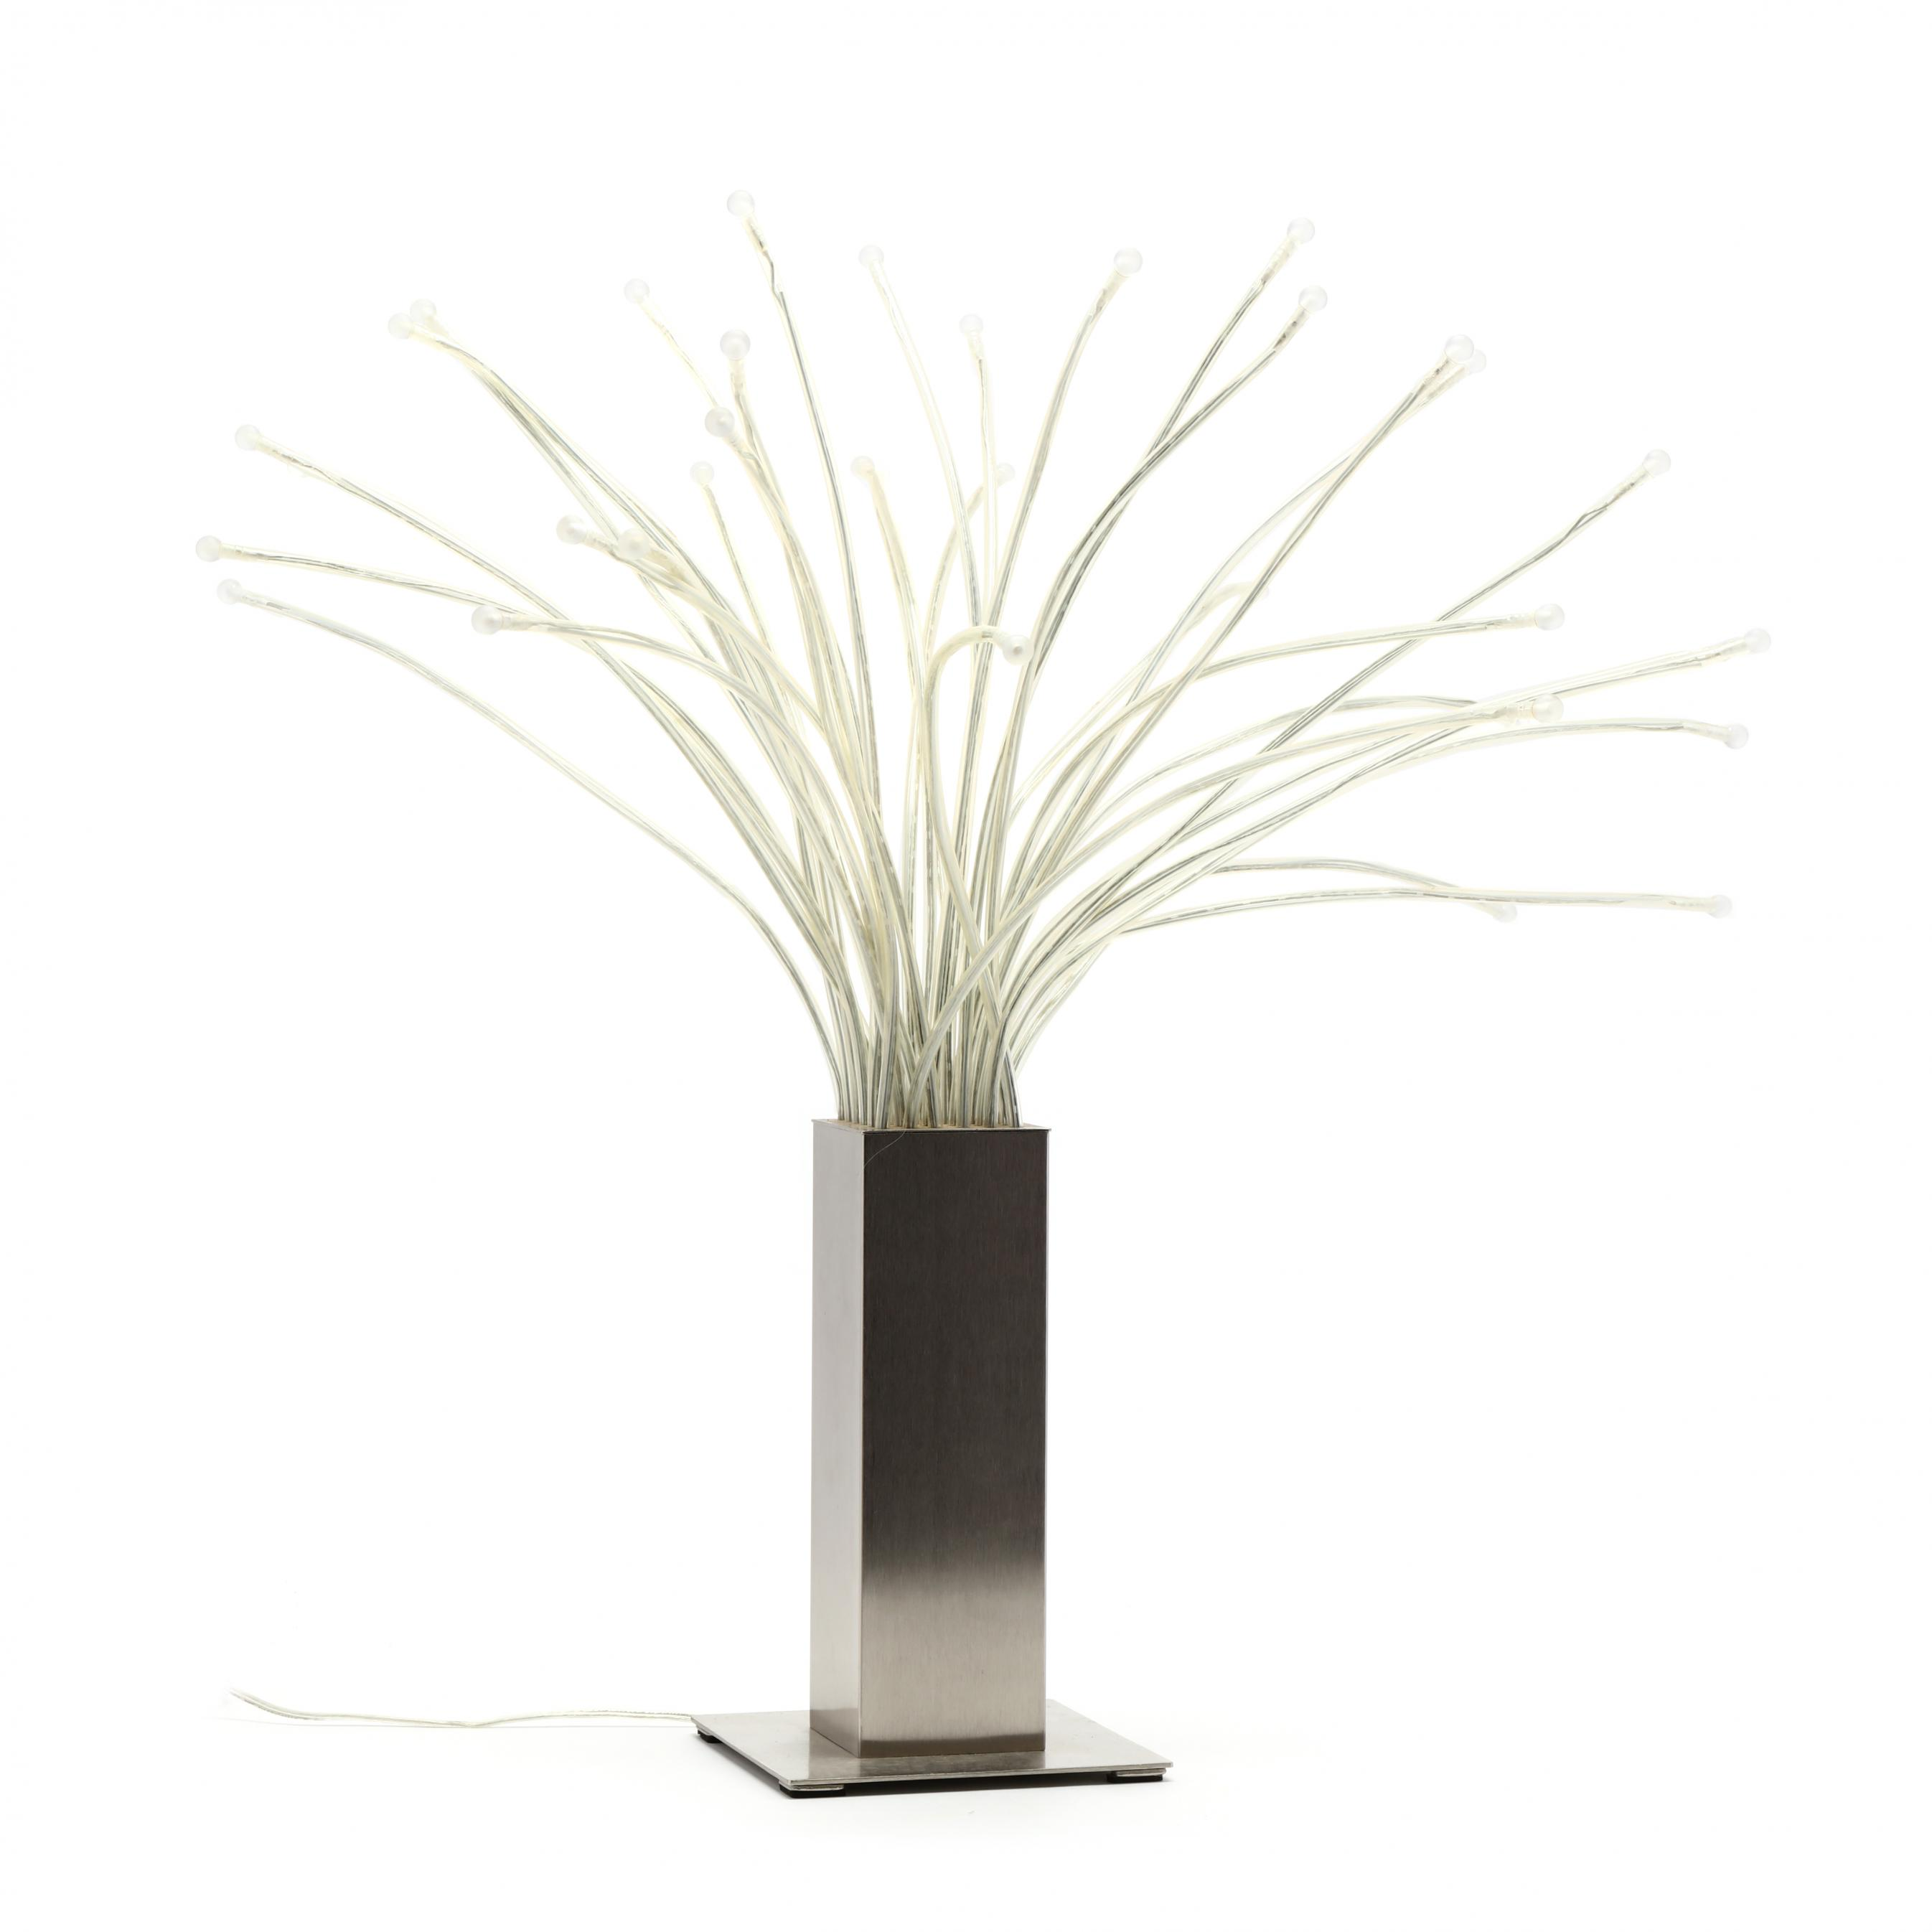 ikea-stranne-table-lamp